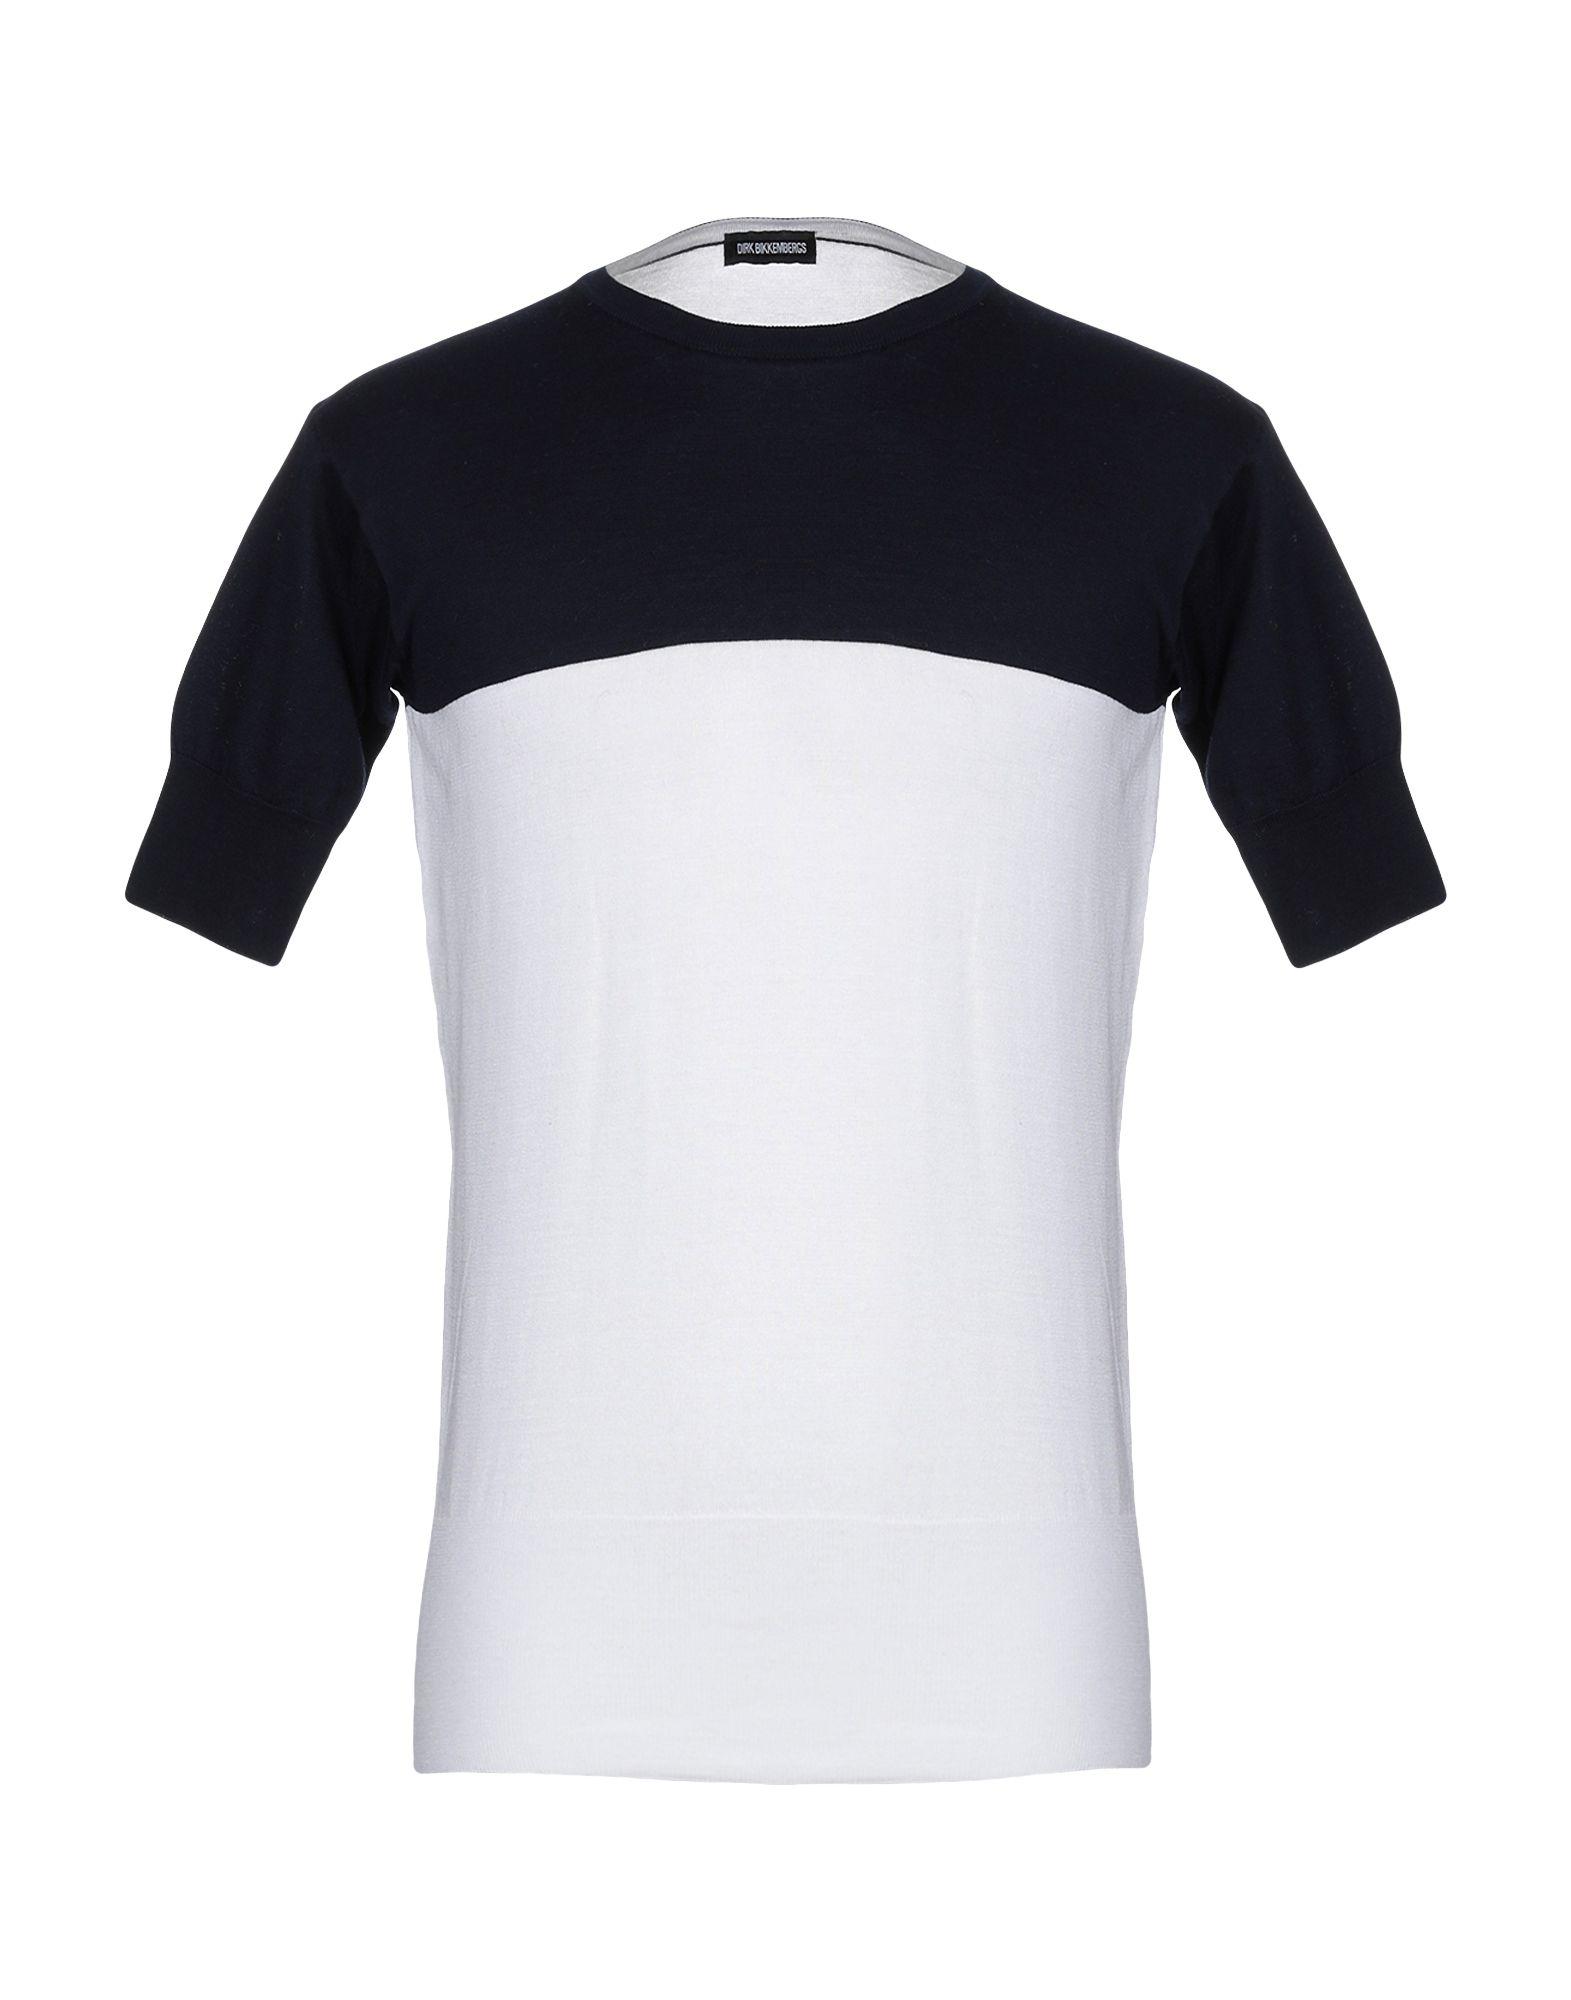 DIRK BIKKEMBERGS Свитер dirk bikkembergs футболка